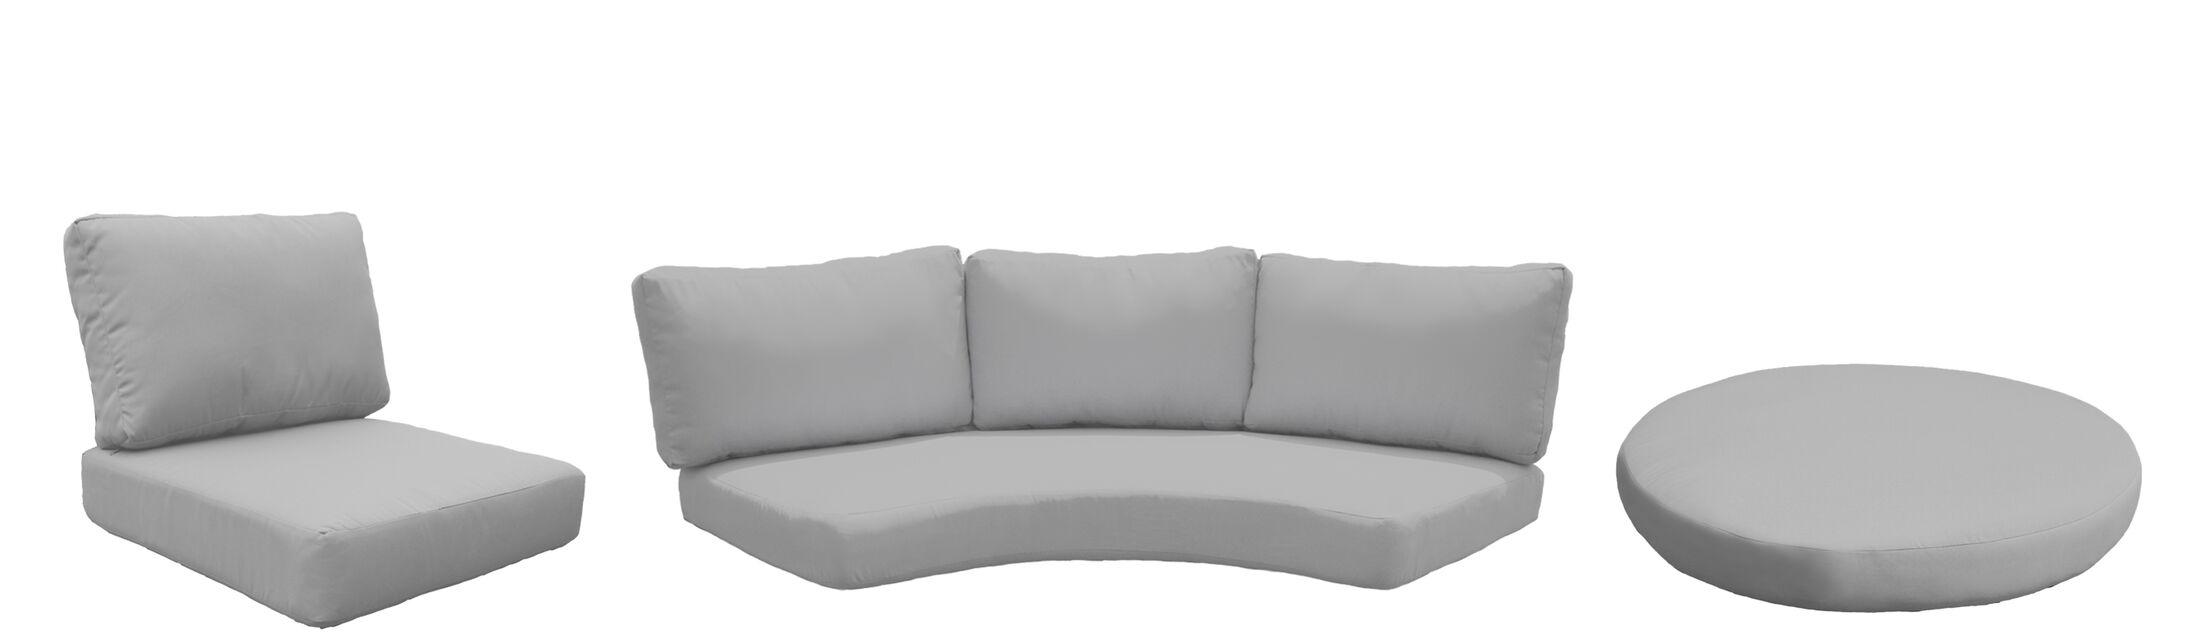 Fairmont 9 Piece Outdoor Cushion Set Fabric: Gray